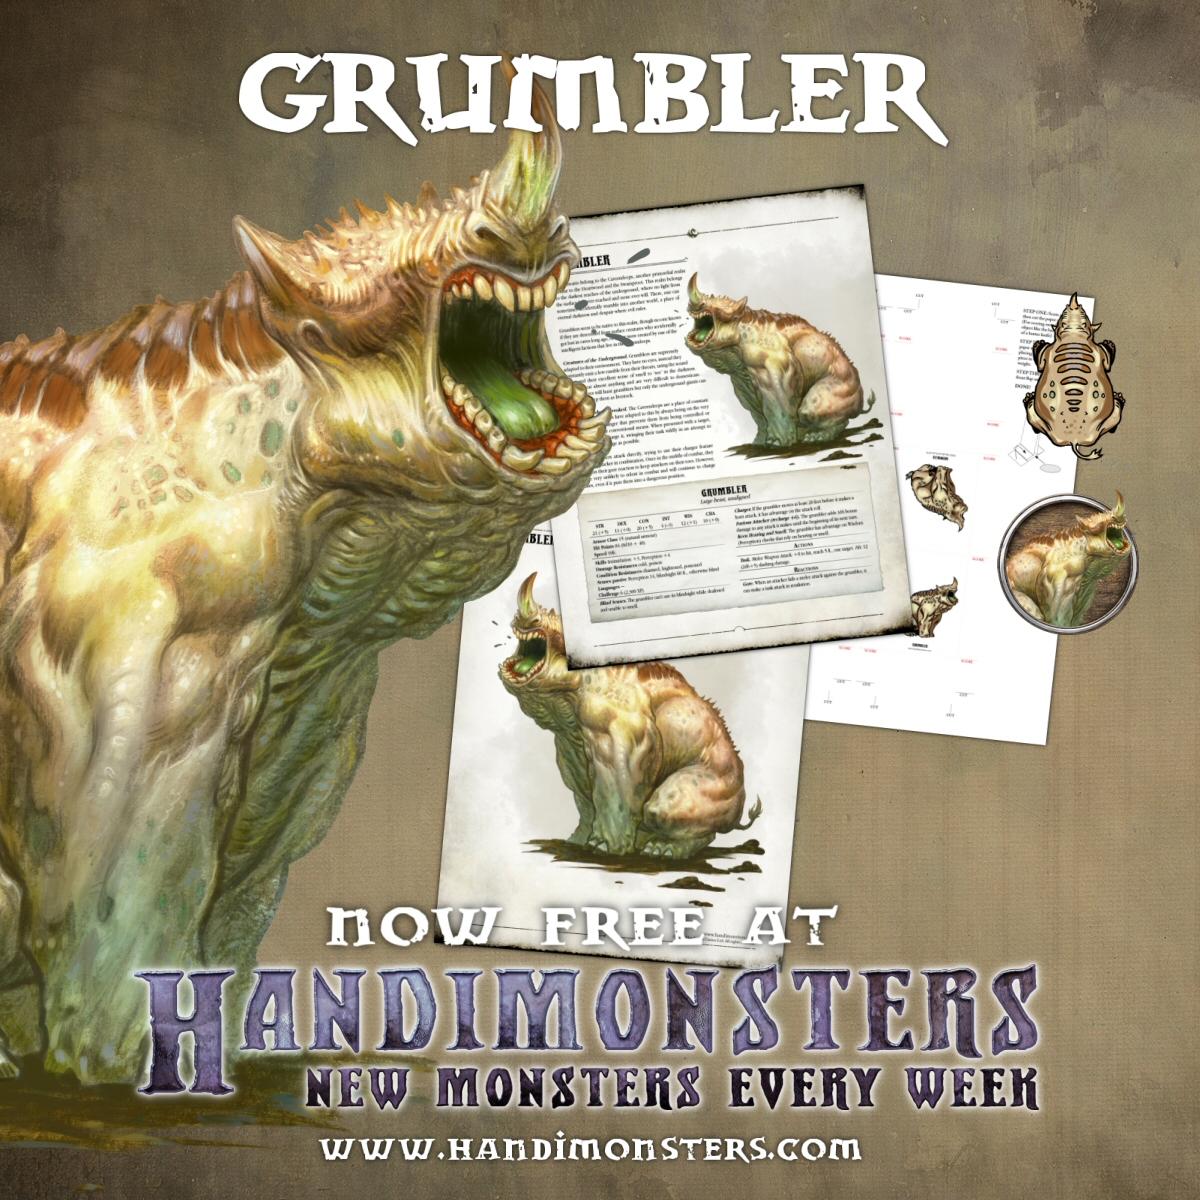 Grumbler-Insta-ad.jpg